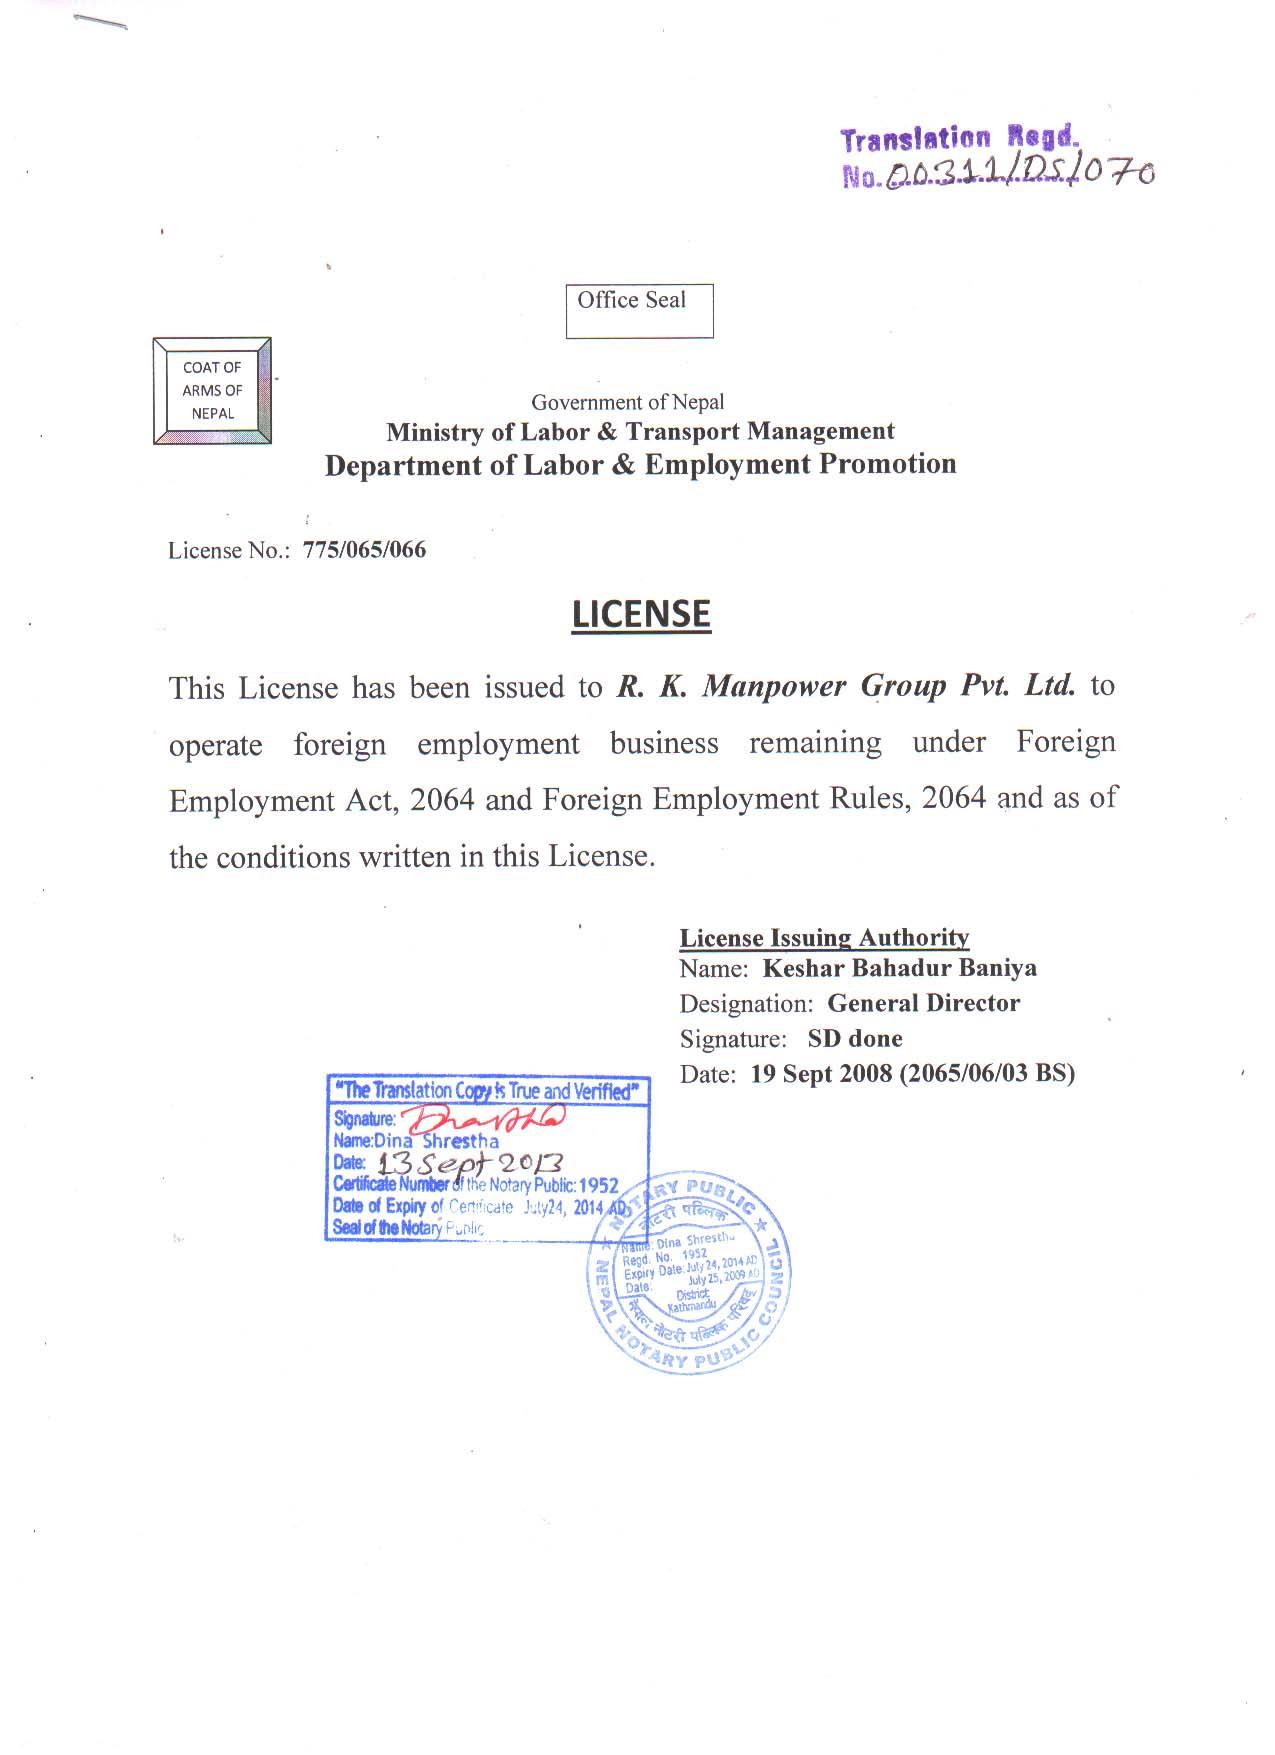 licence-no-0